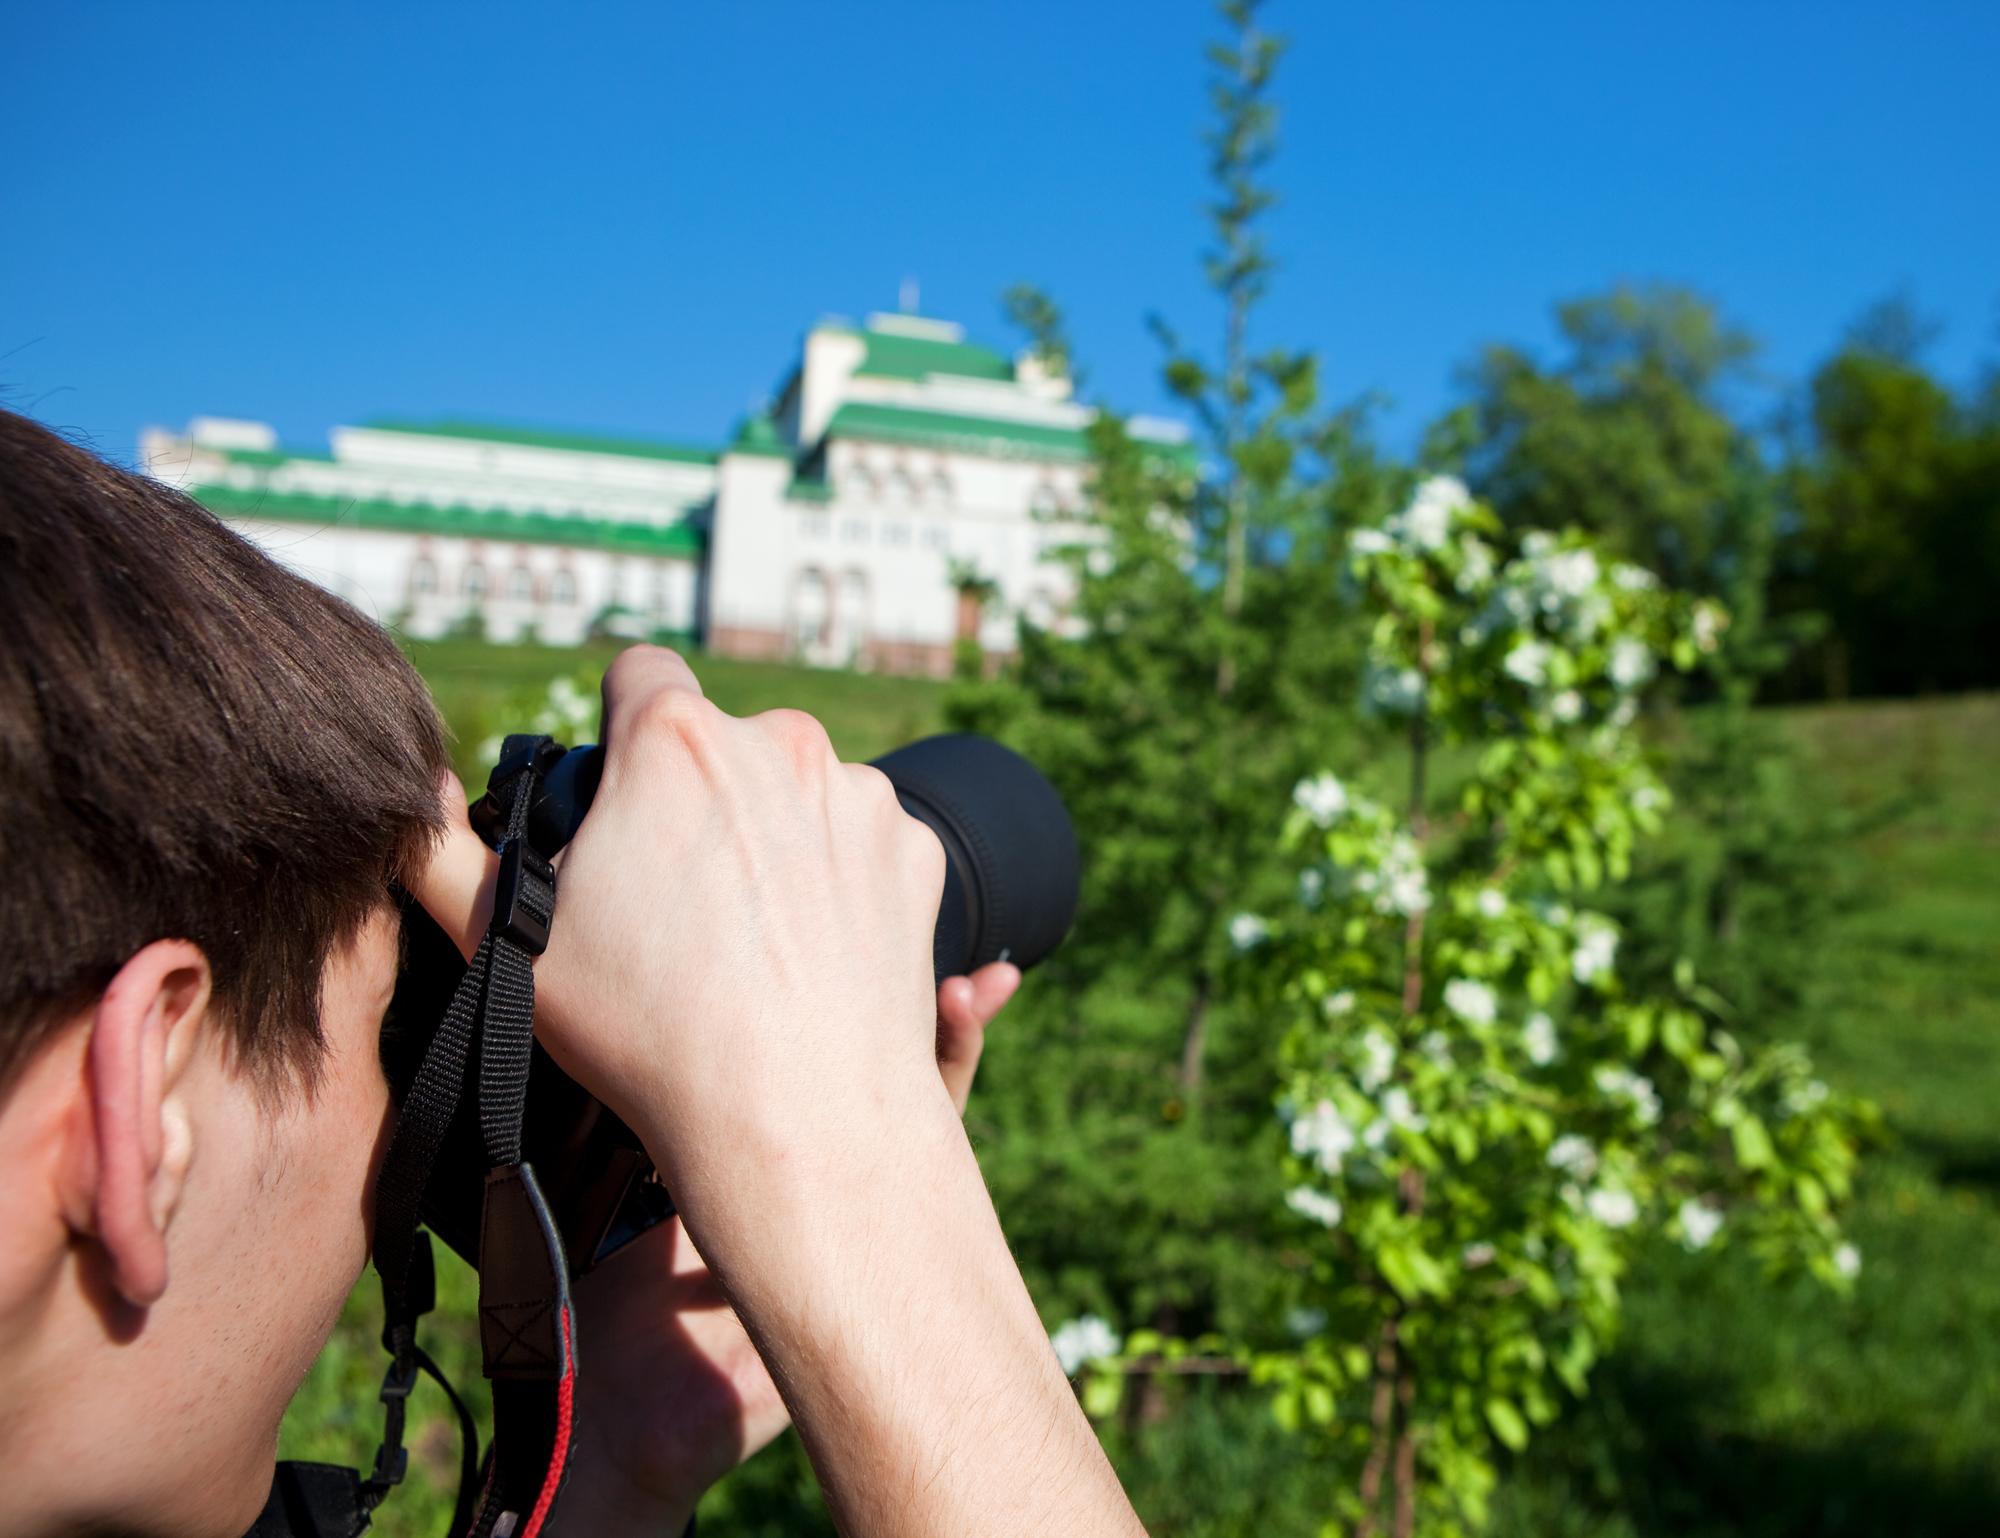 Photographer, Camera, Lense, Photography, Shooting, HQ Photo